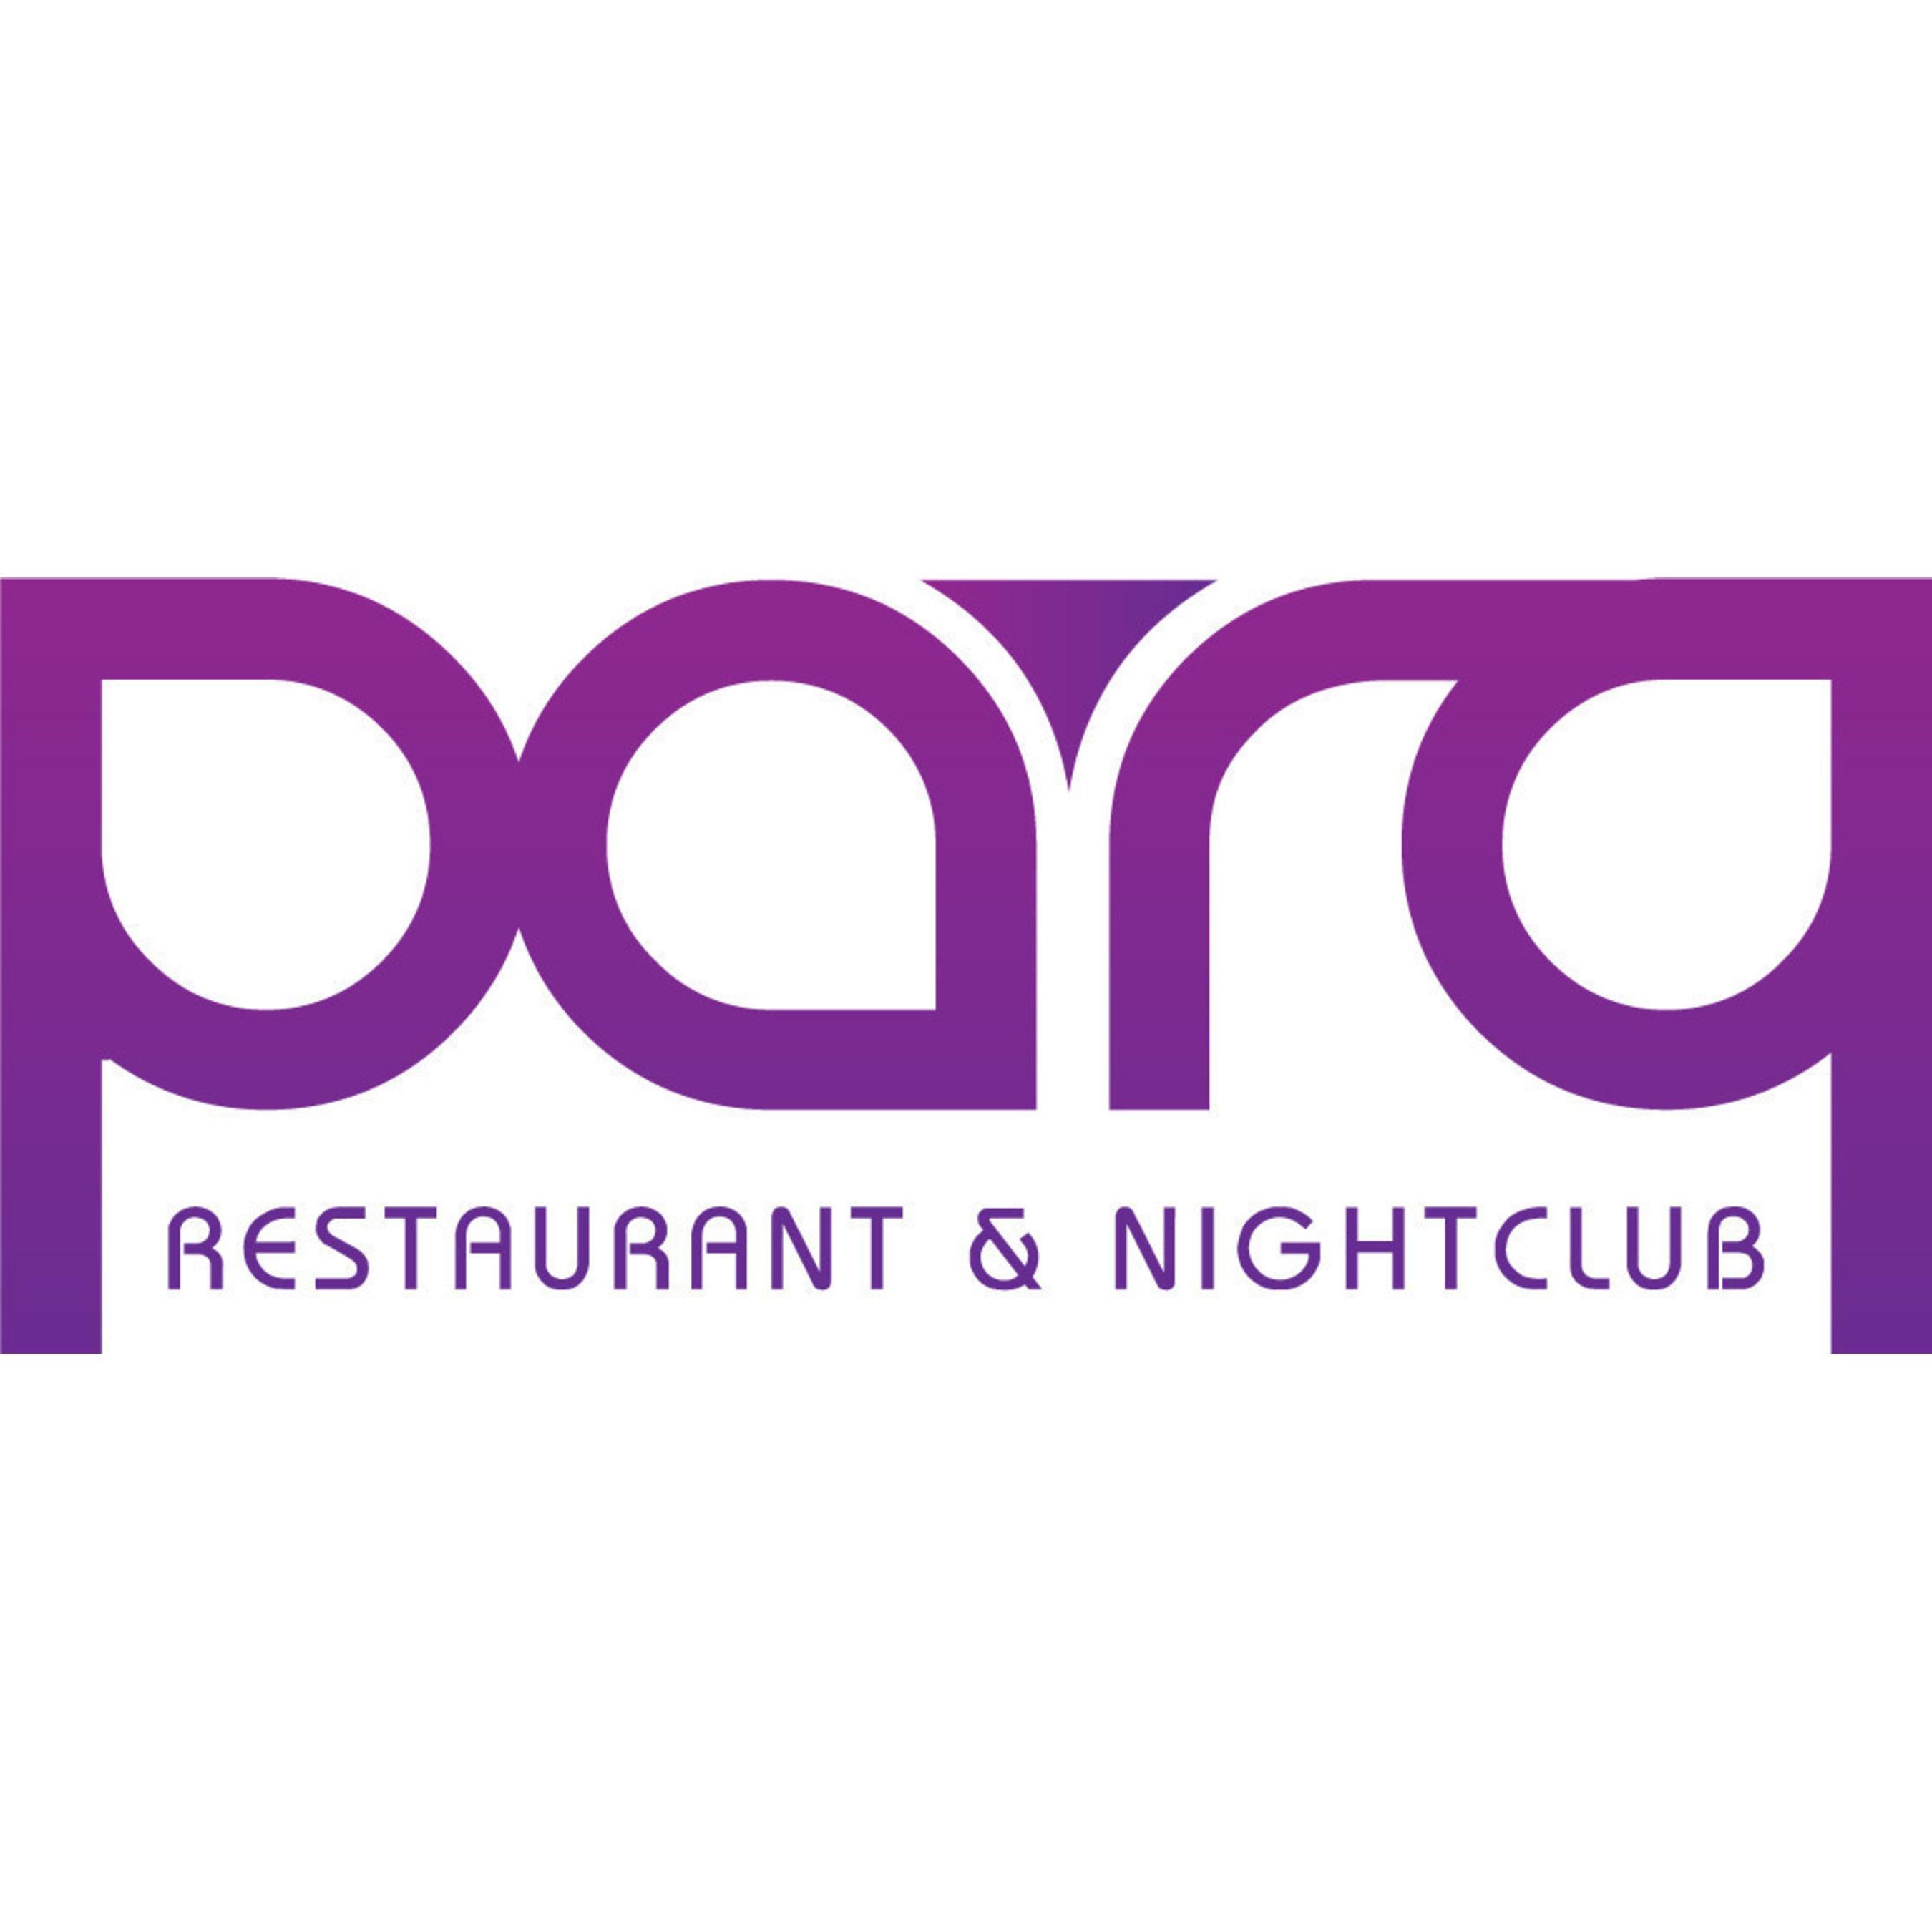 Parq Restaurant & Nightclub image 0